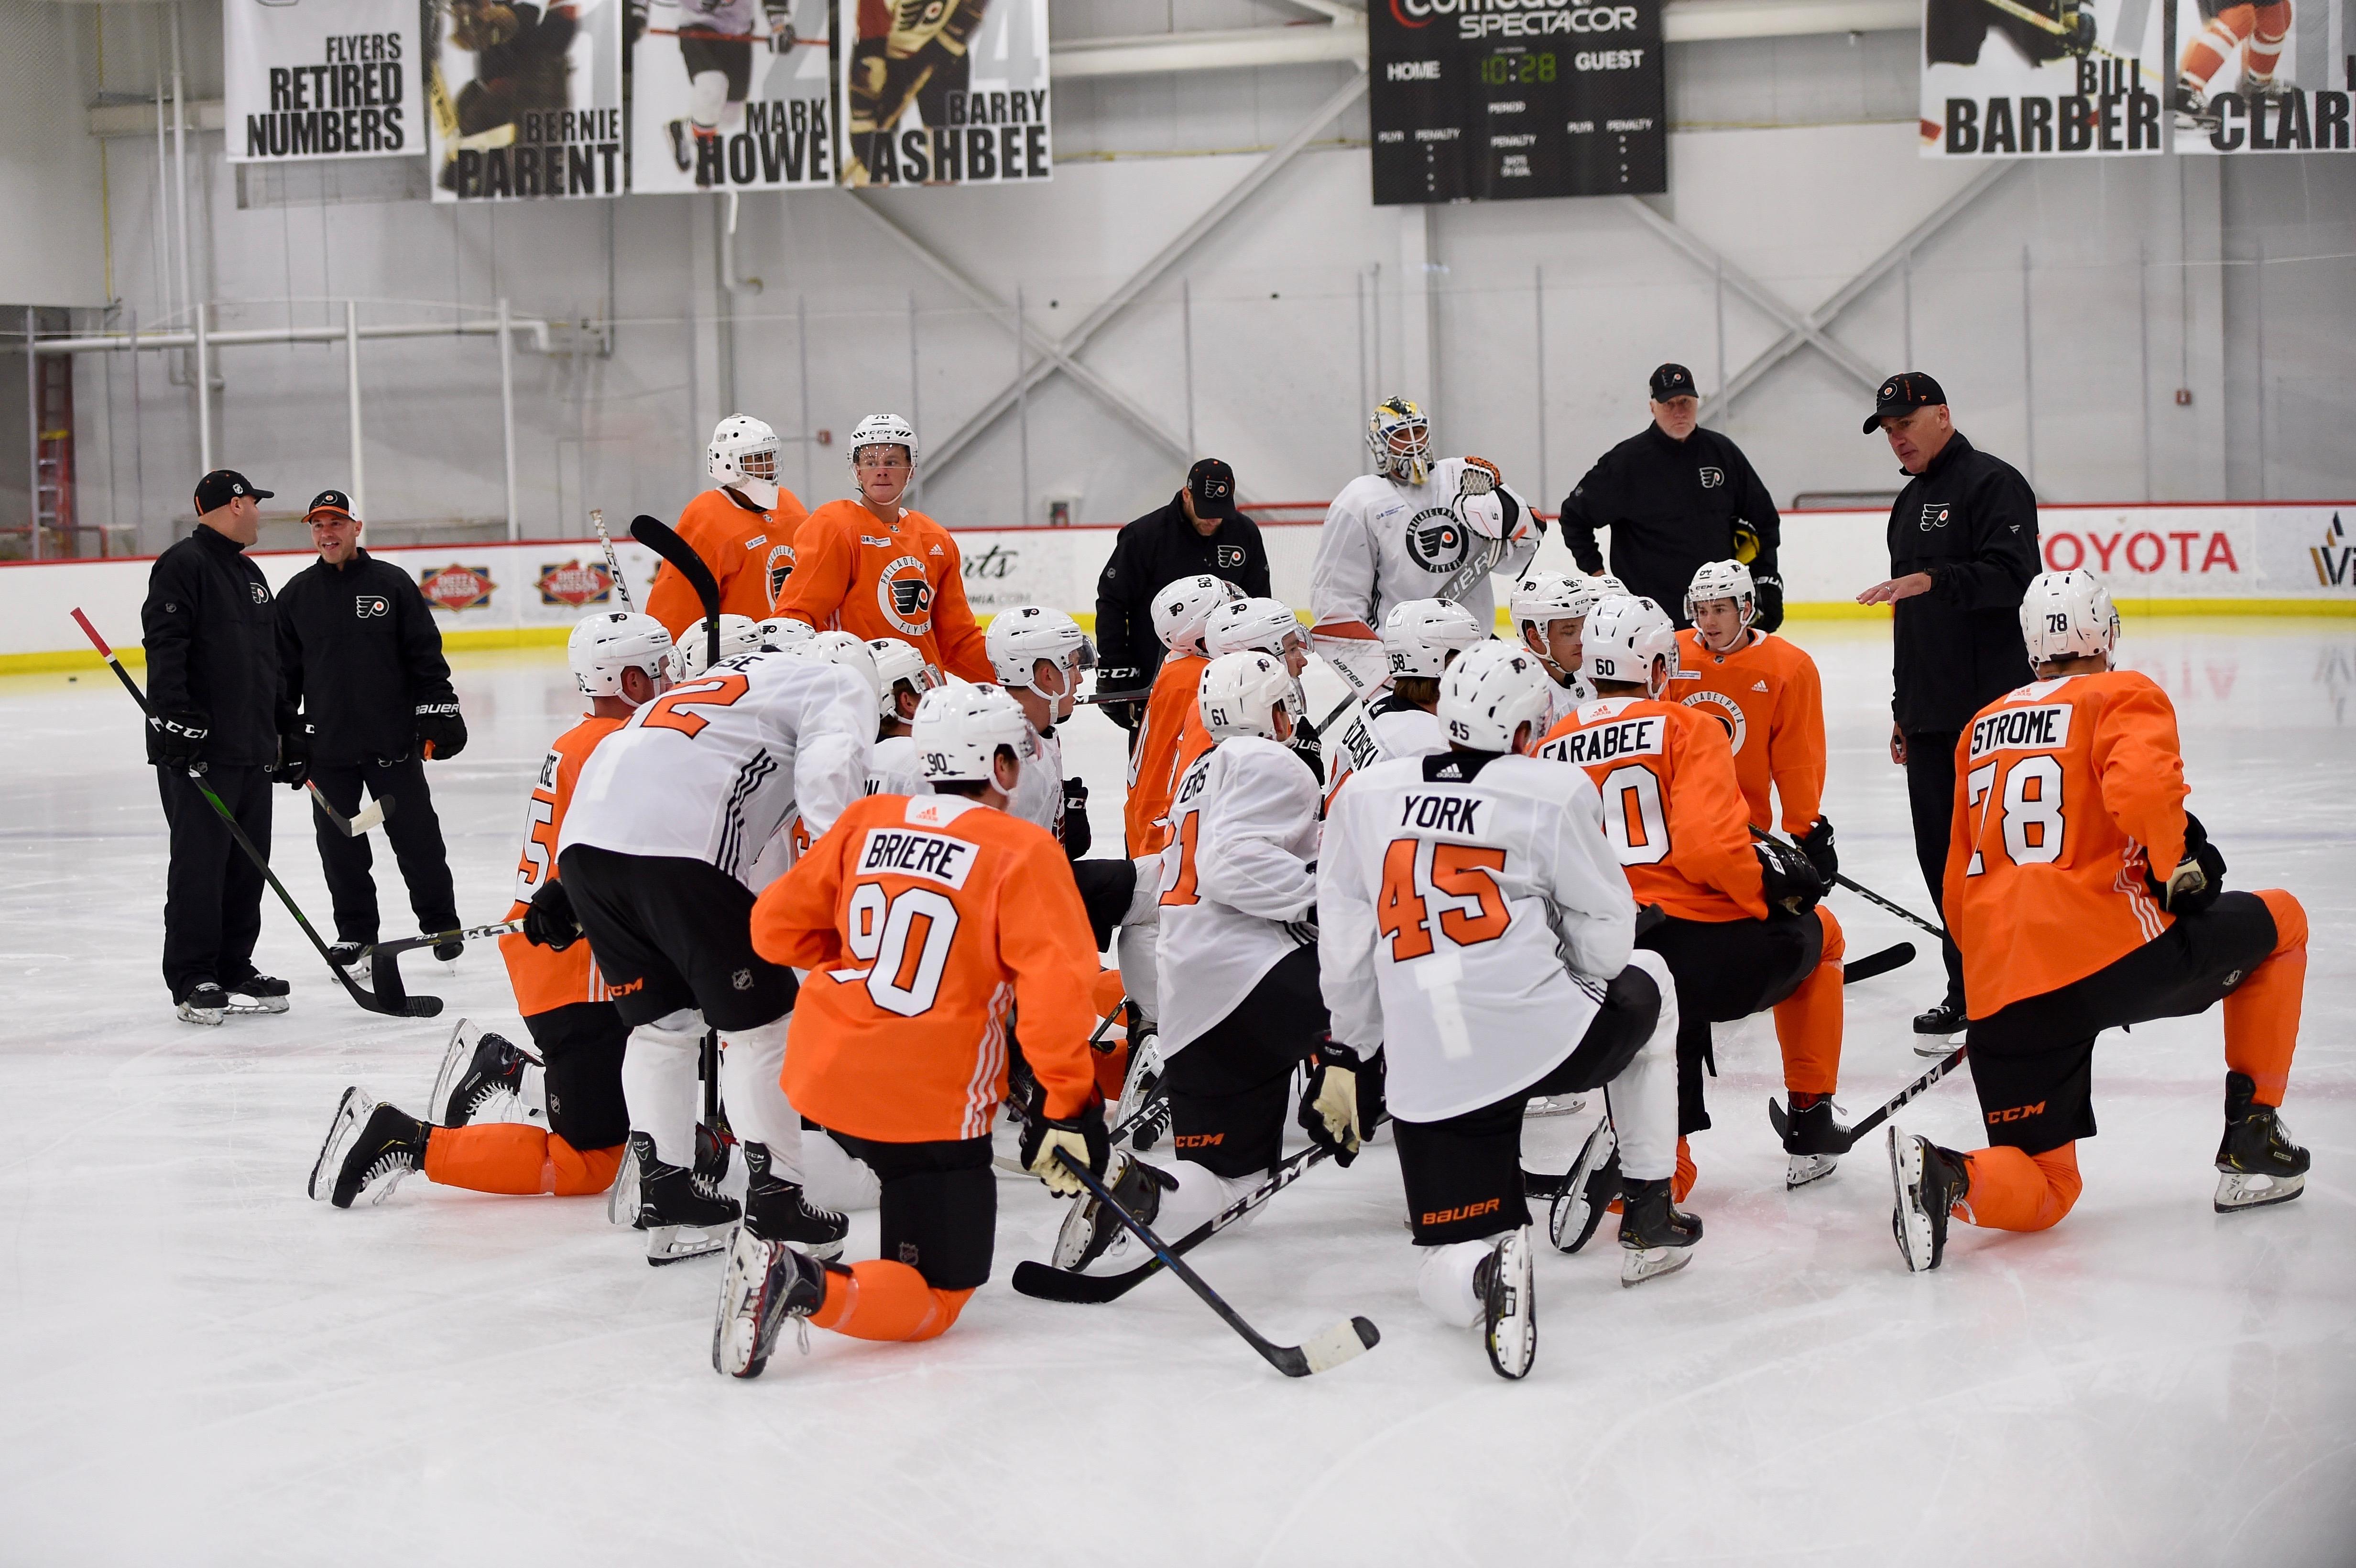 NHL: JUN 26 Philadelphia Flyers Development Camp